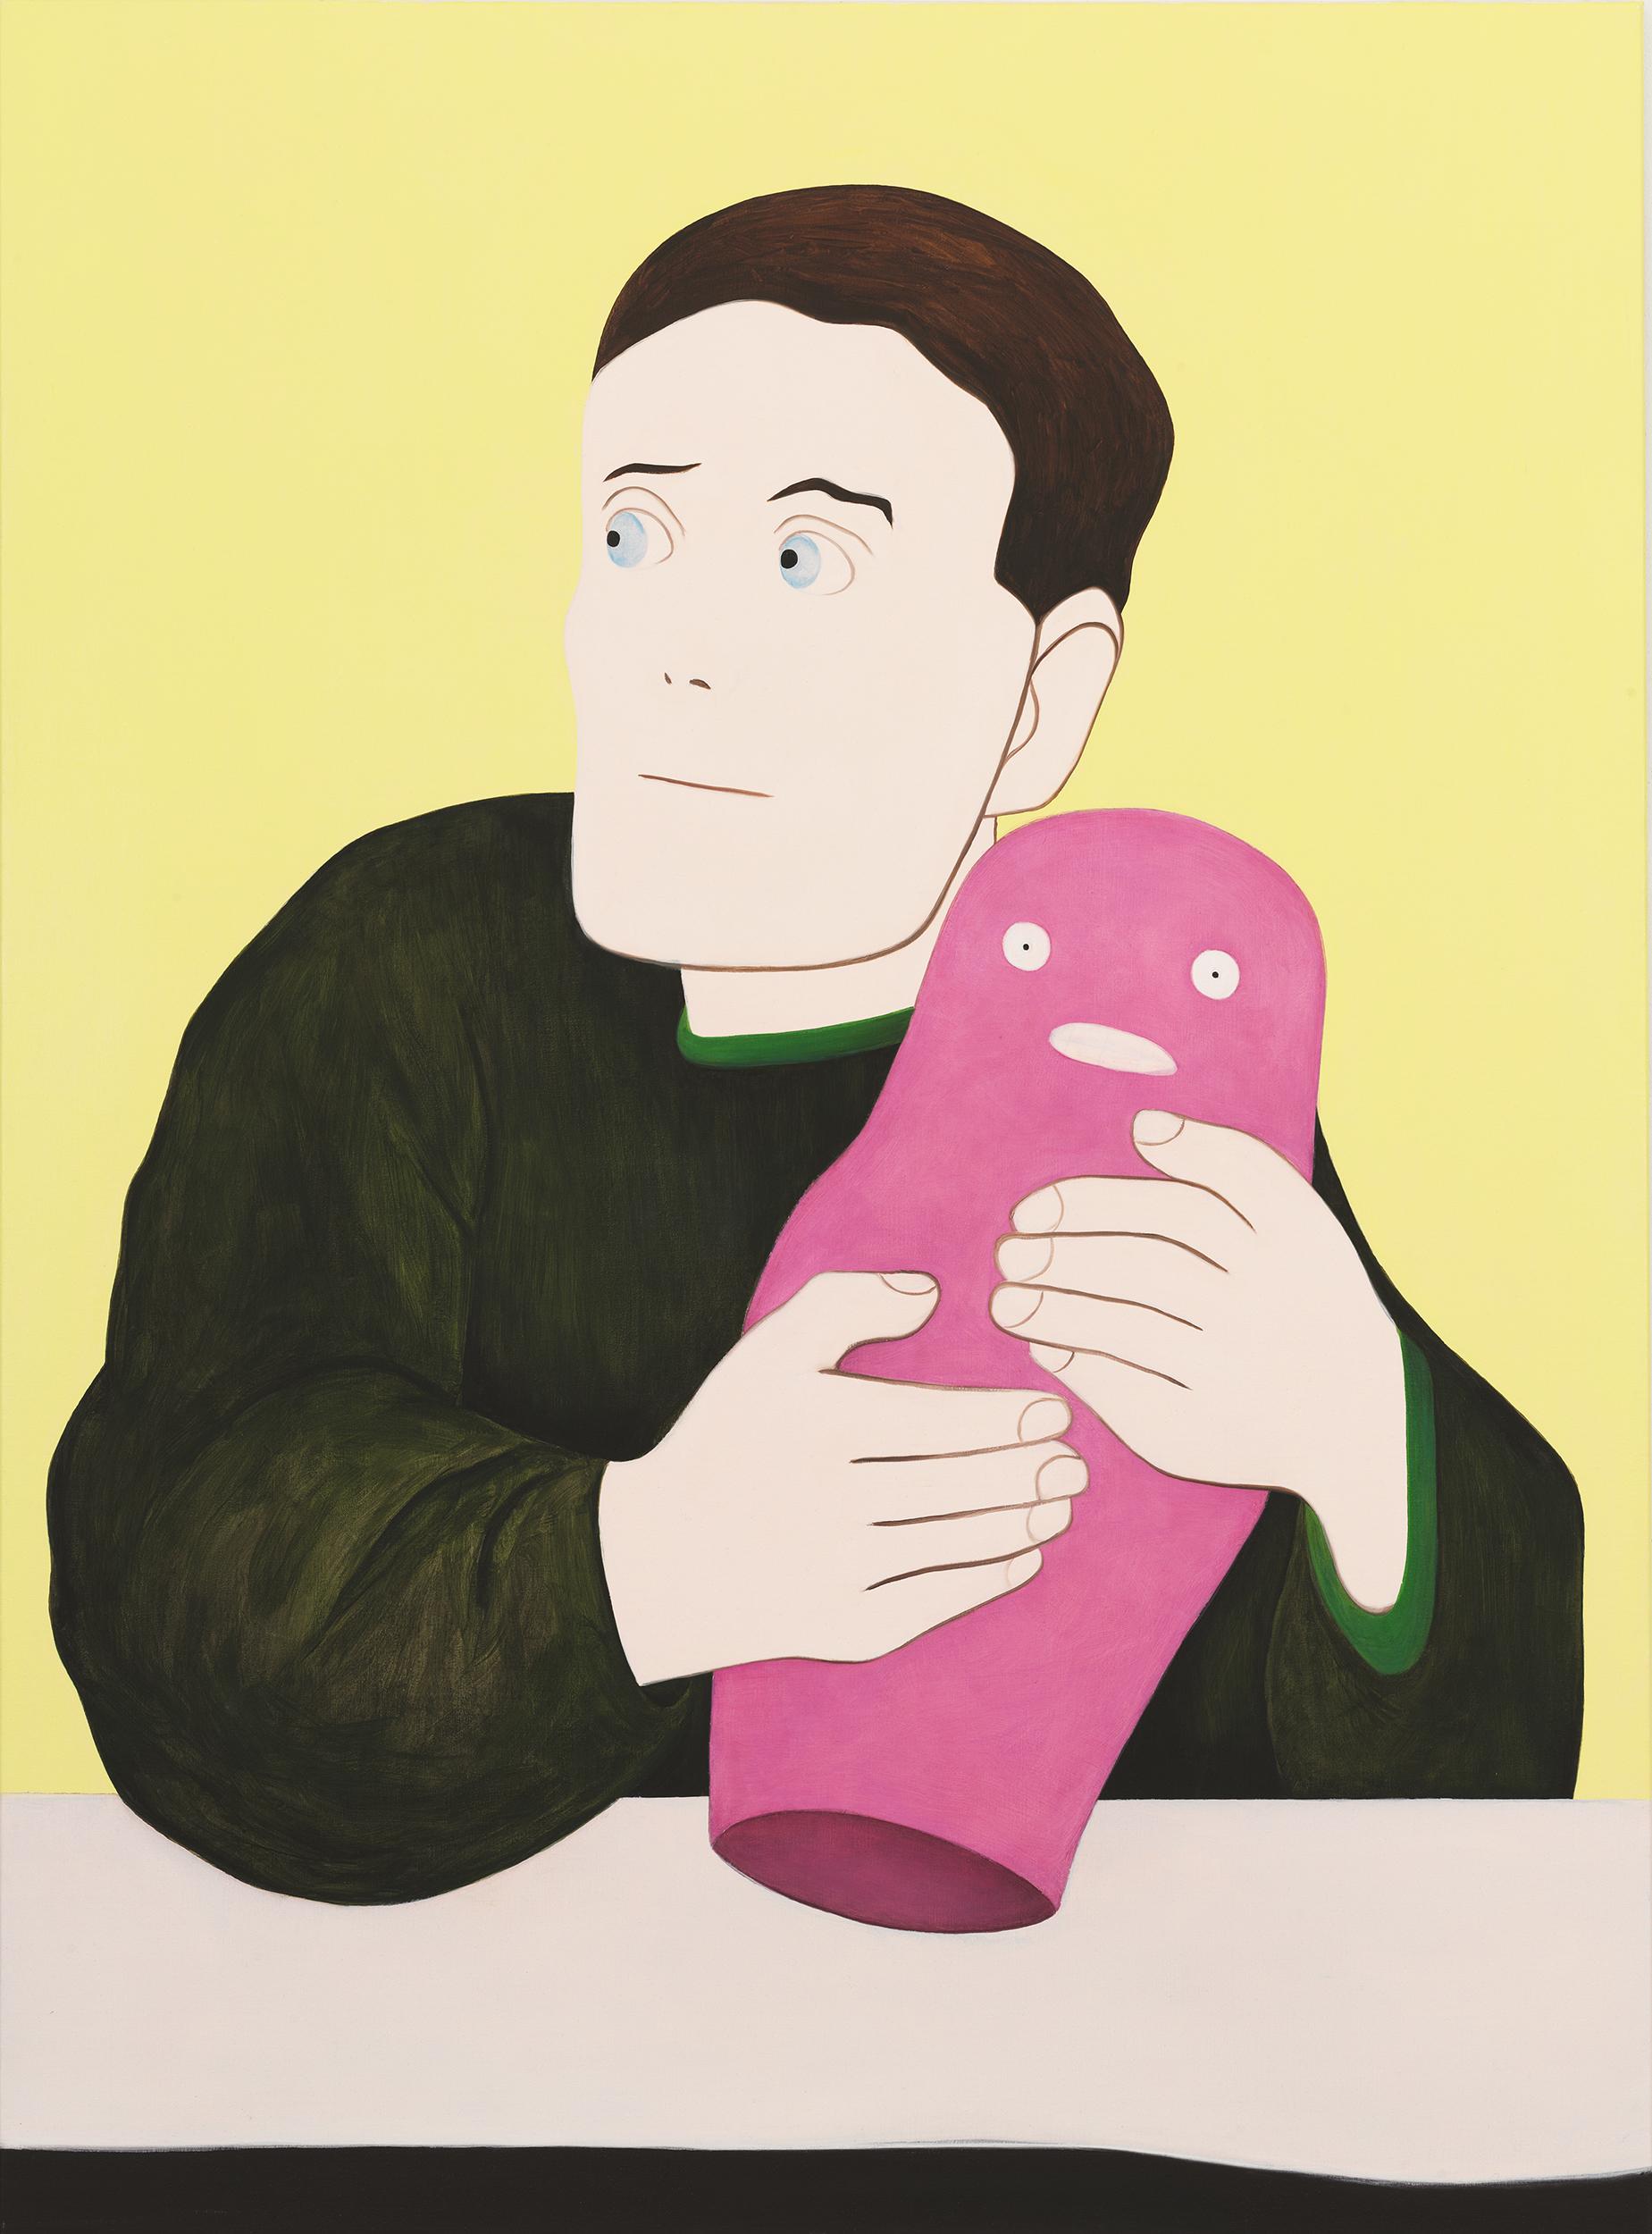 Self-portrait with Barbapapa, painting by Wouter van Riessen